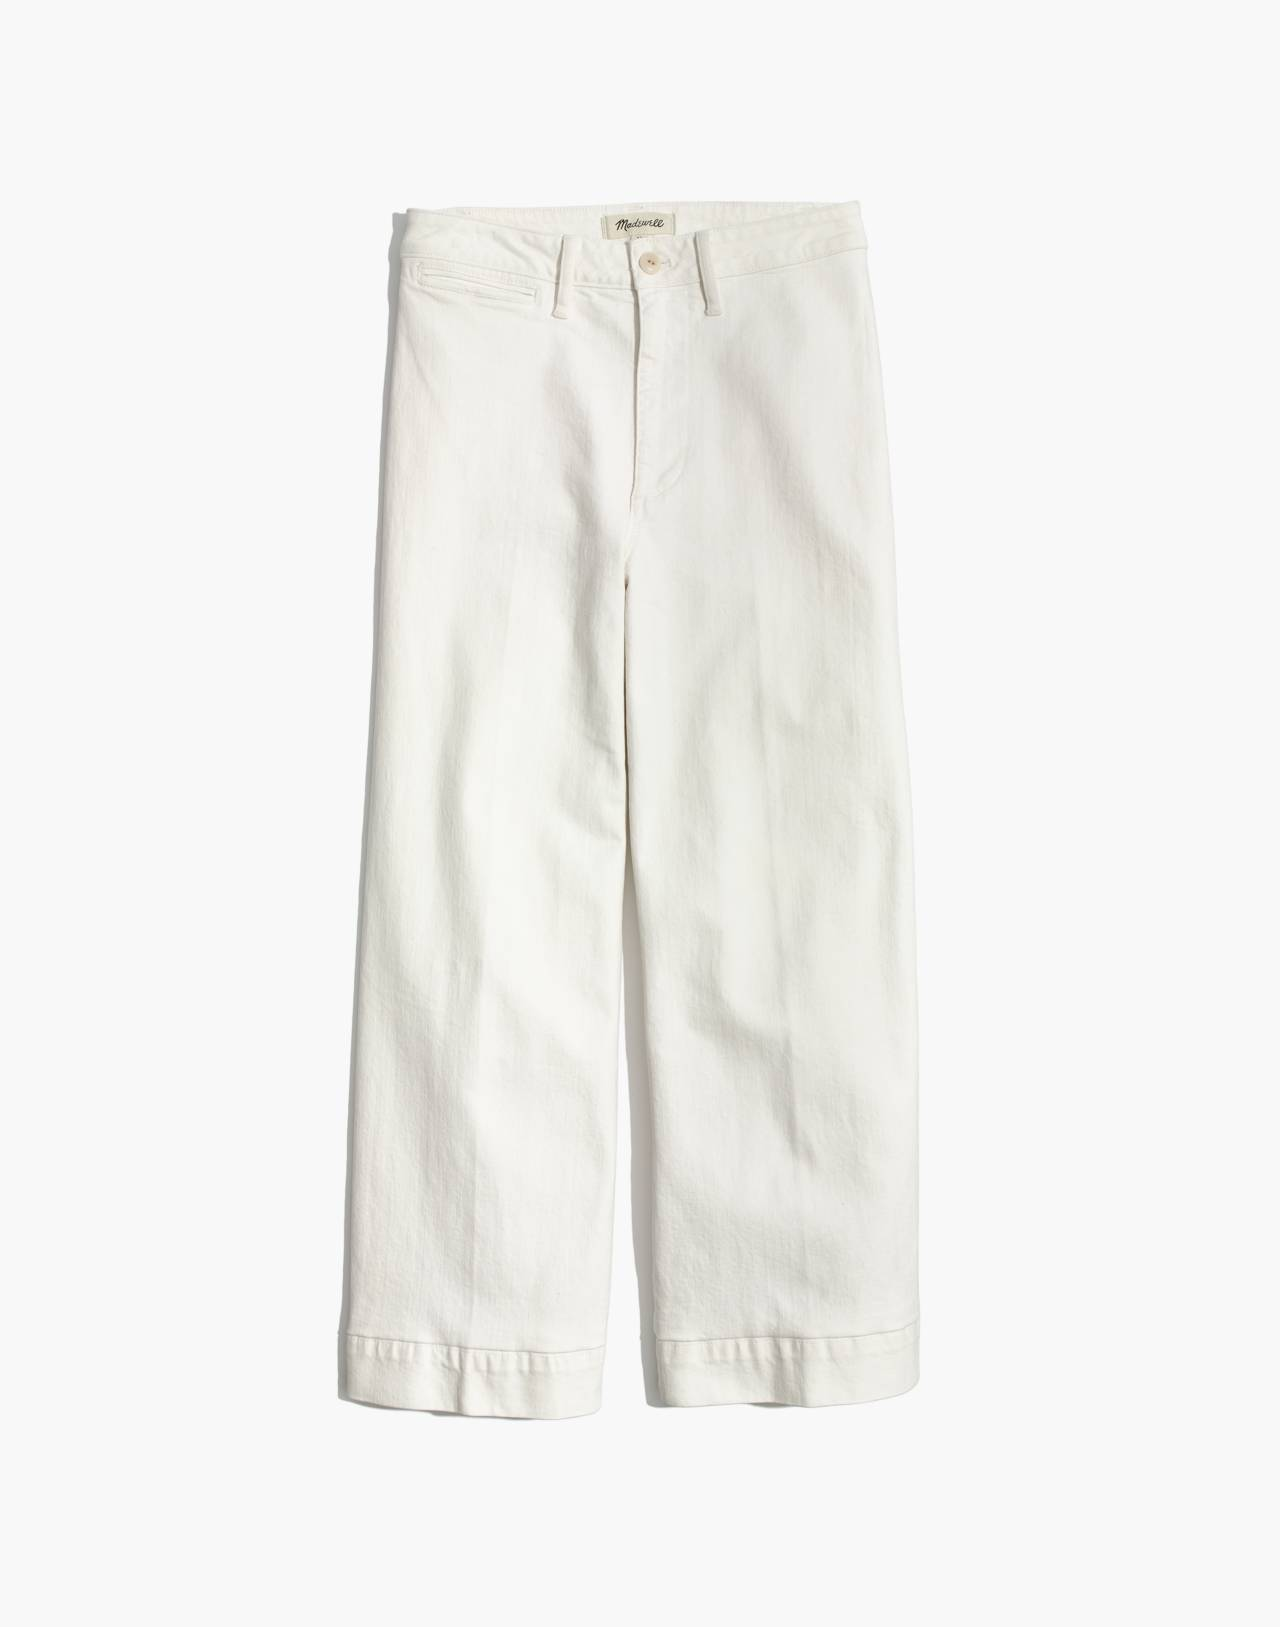 Tall Emmett Wide-Leg Crop Jeans in Tile White in tile white image 4